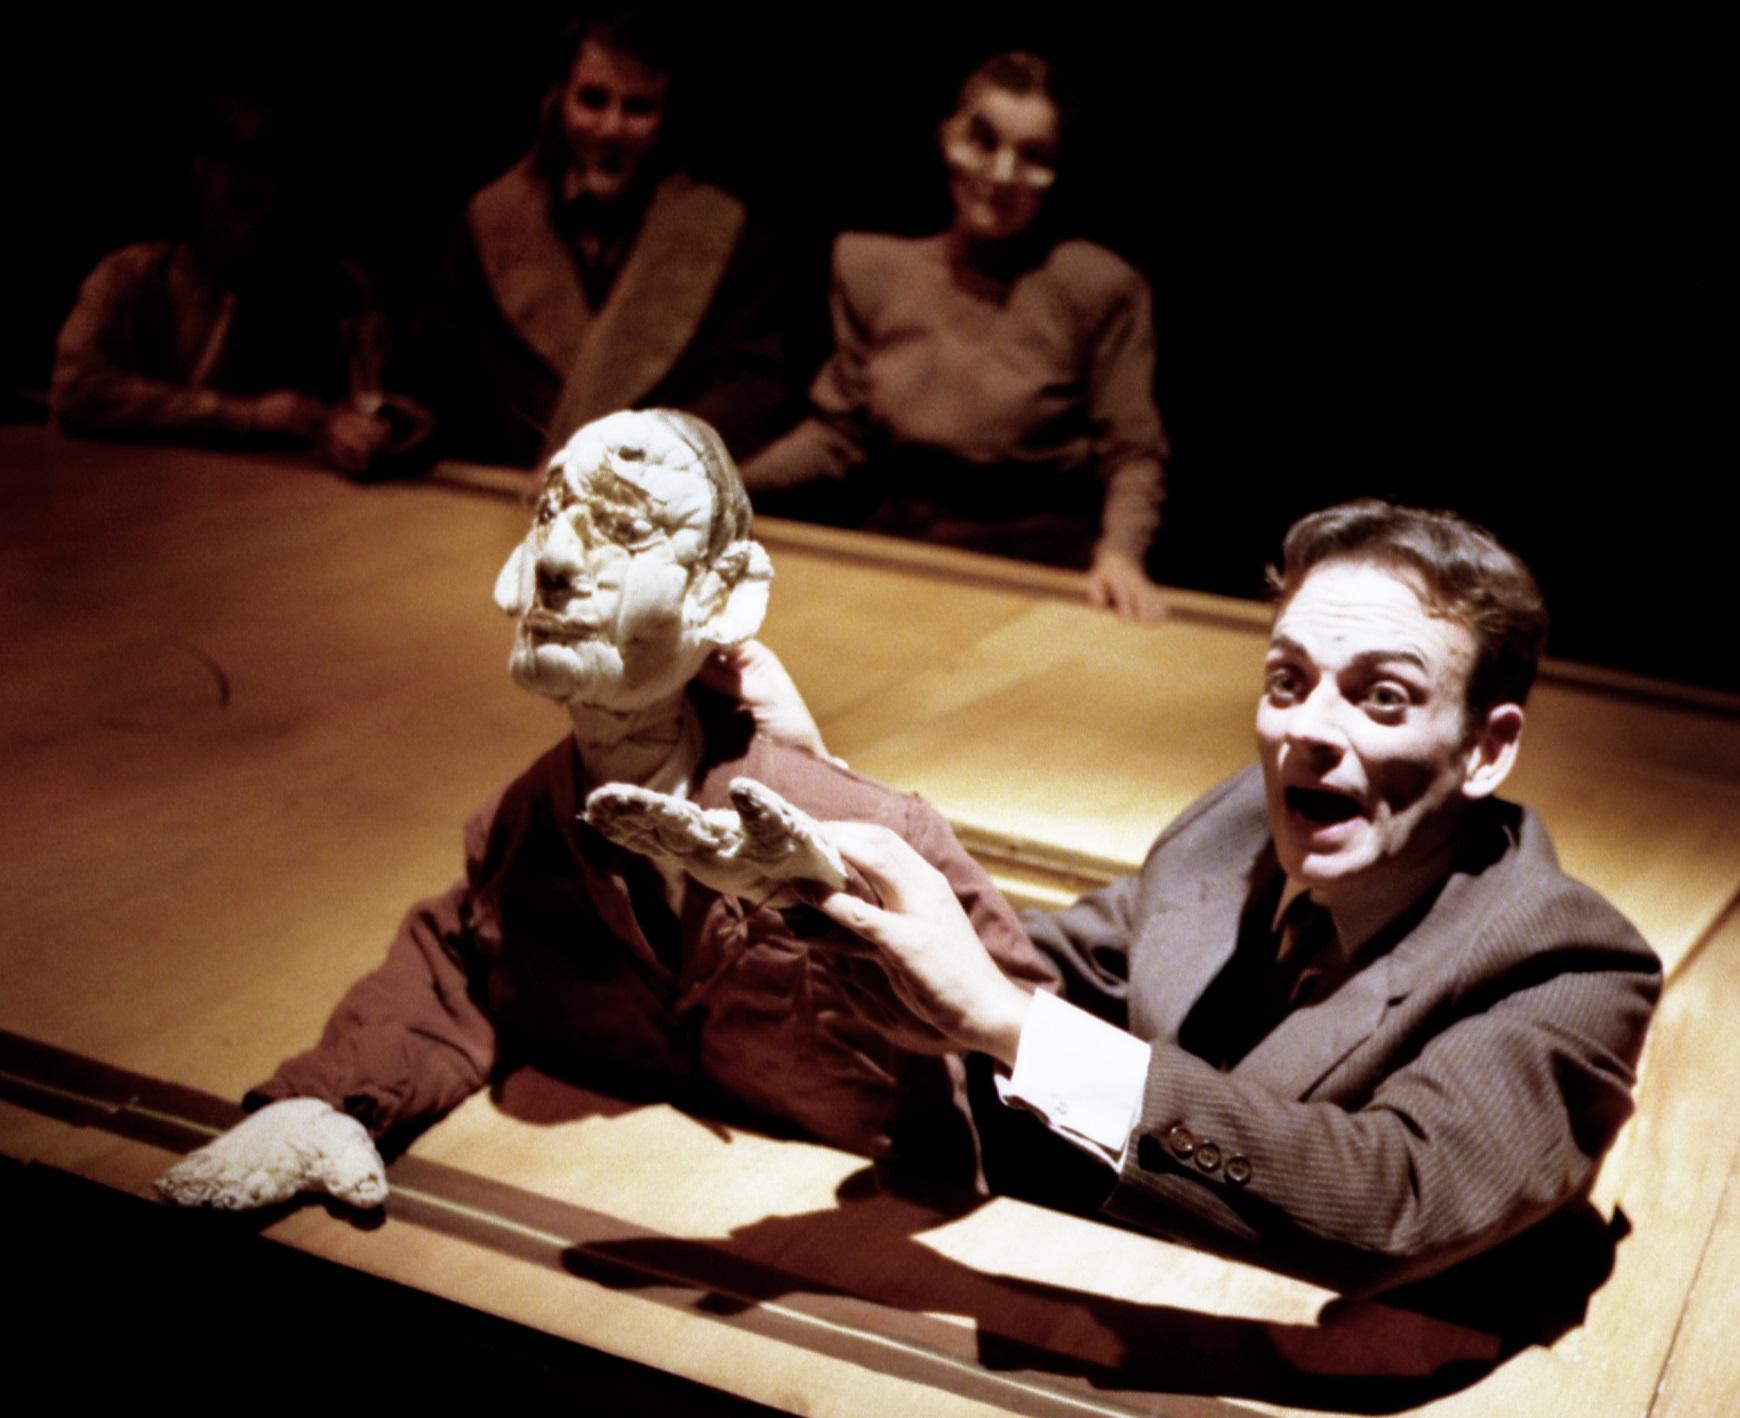 Le Bal de Kafka de Timothy Daly, mise en scène Isabelle Starkier avec Sébastien Desjours. ©Photo Jean-Pierre Benzekri